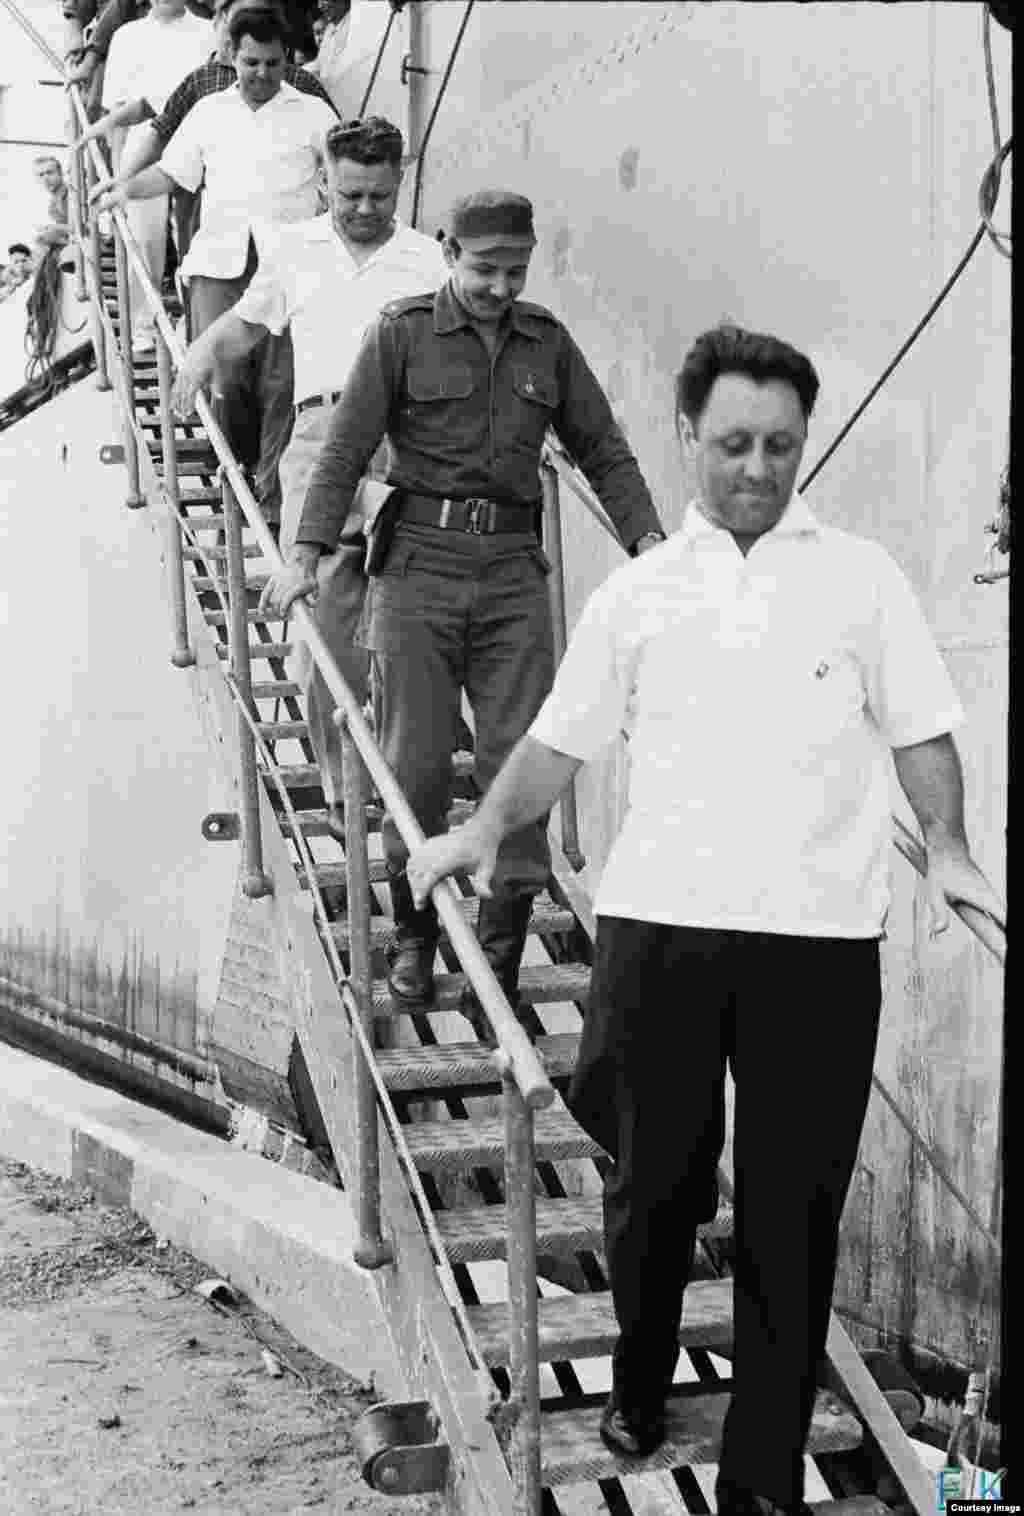 Descendiendo Raúl Castro del buque soviético Lgove.